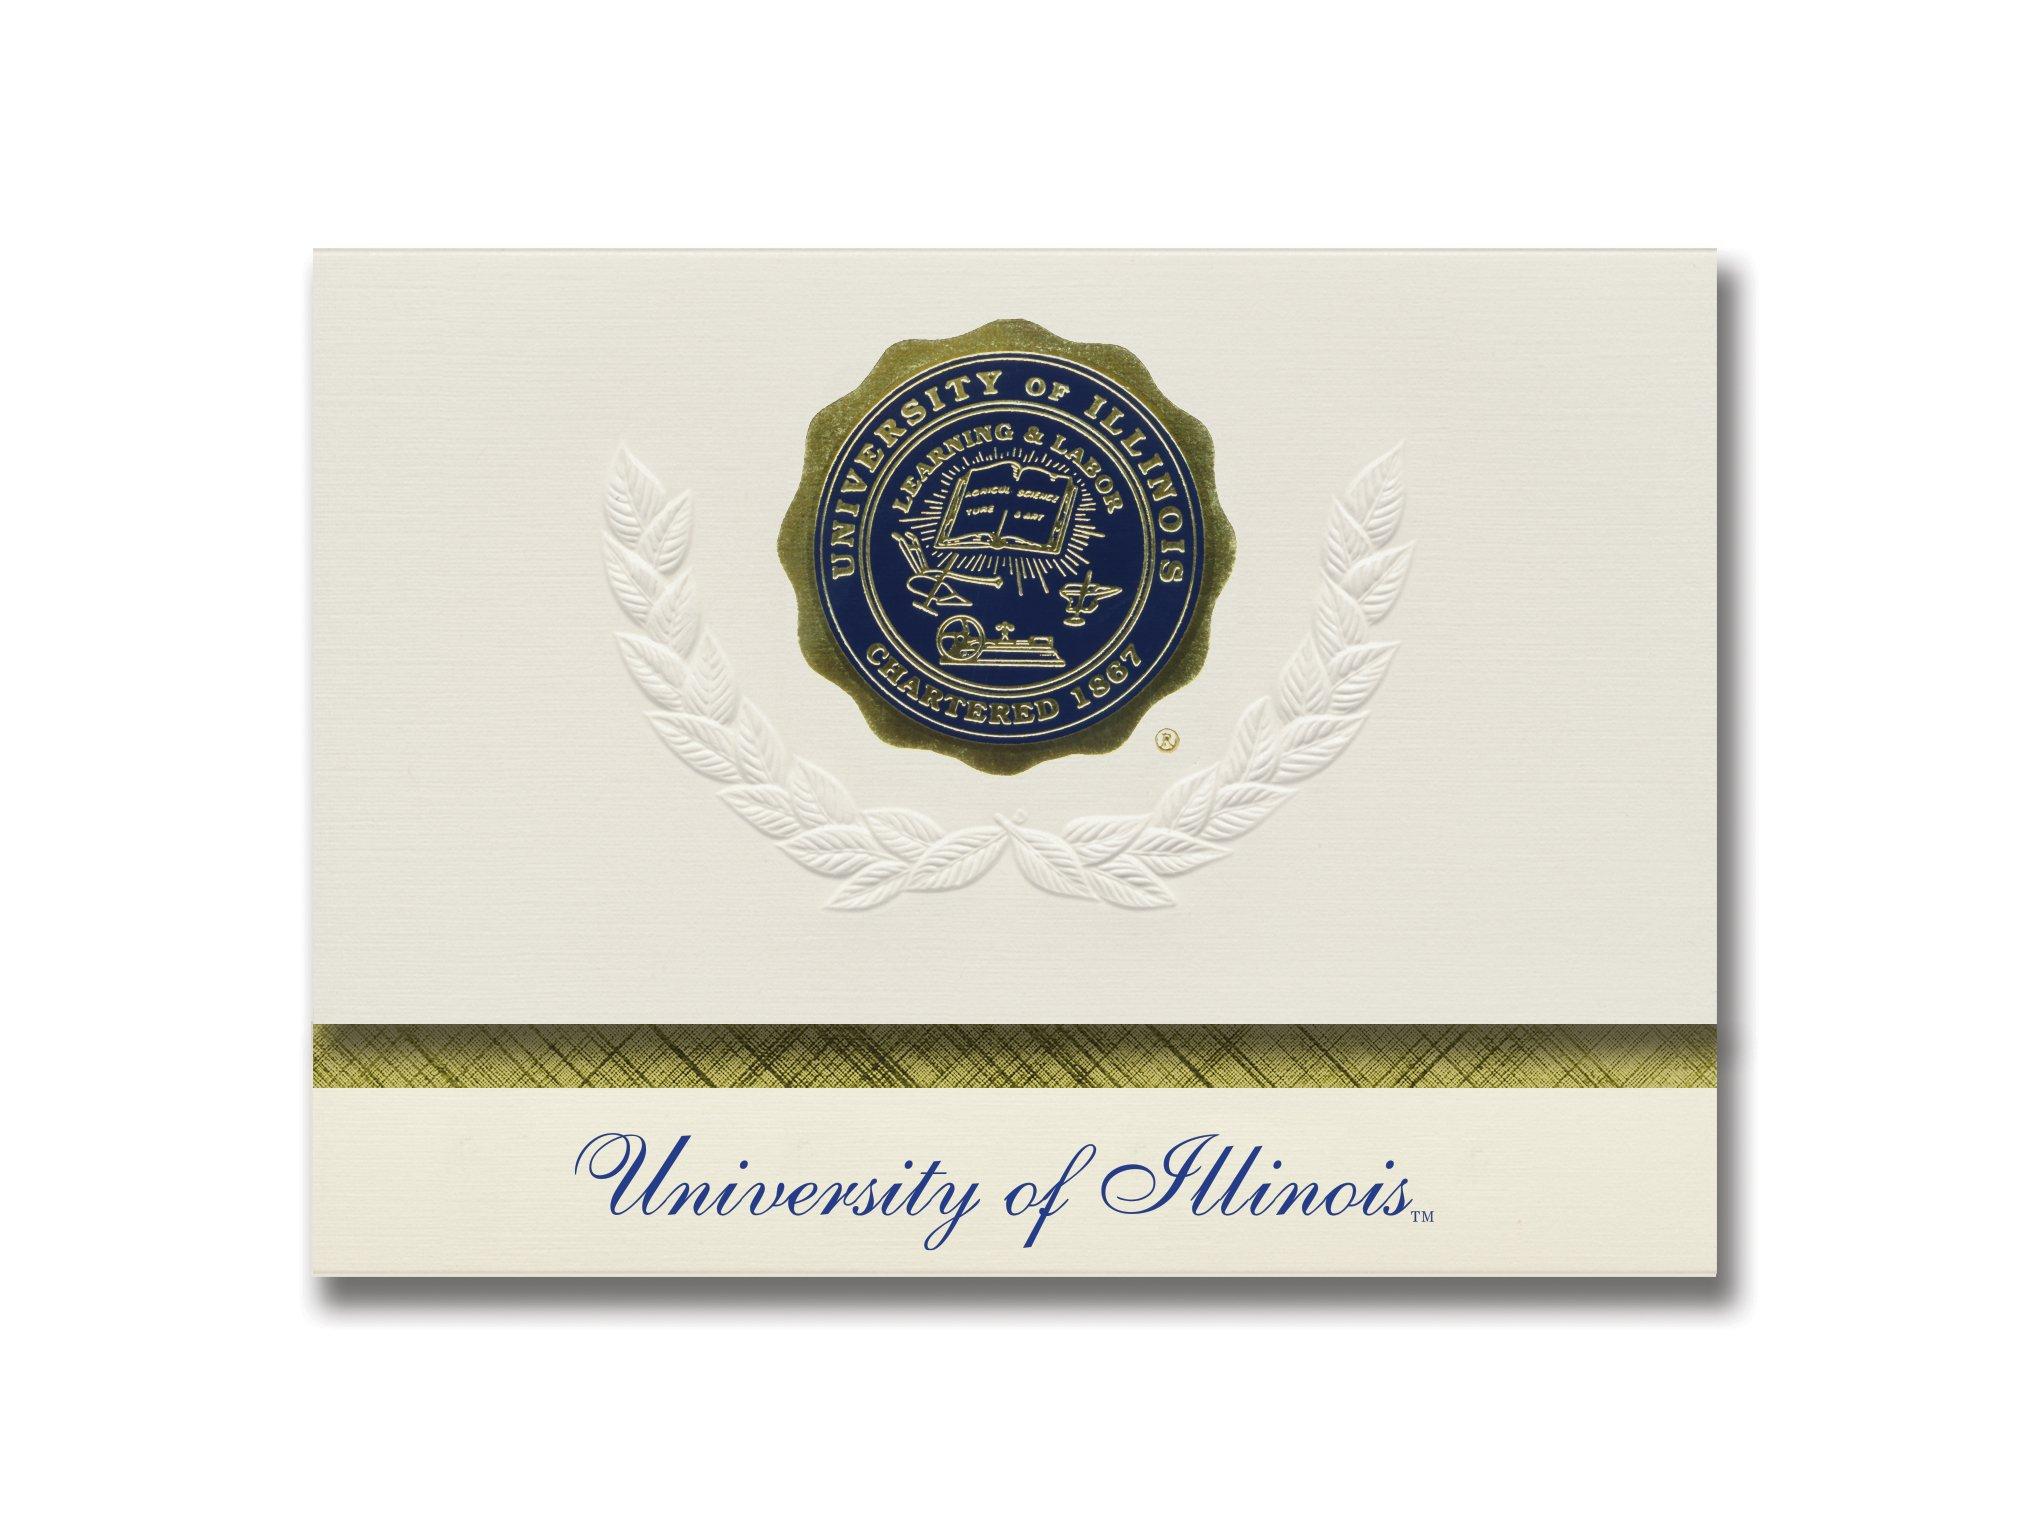 Signature Announcements University of Illinois at Urbana-Champaign Graduation Announcements, Platinum style, Elite Pack 20 with U. of Illinois-Urbana-Champaign Seal Foil